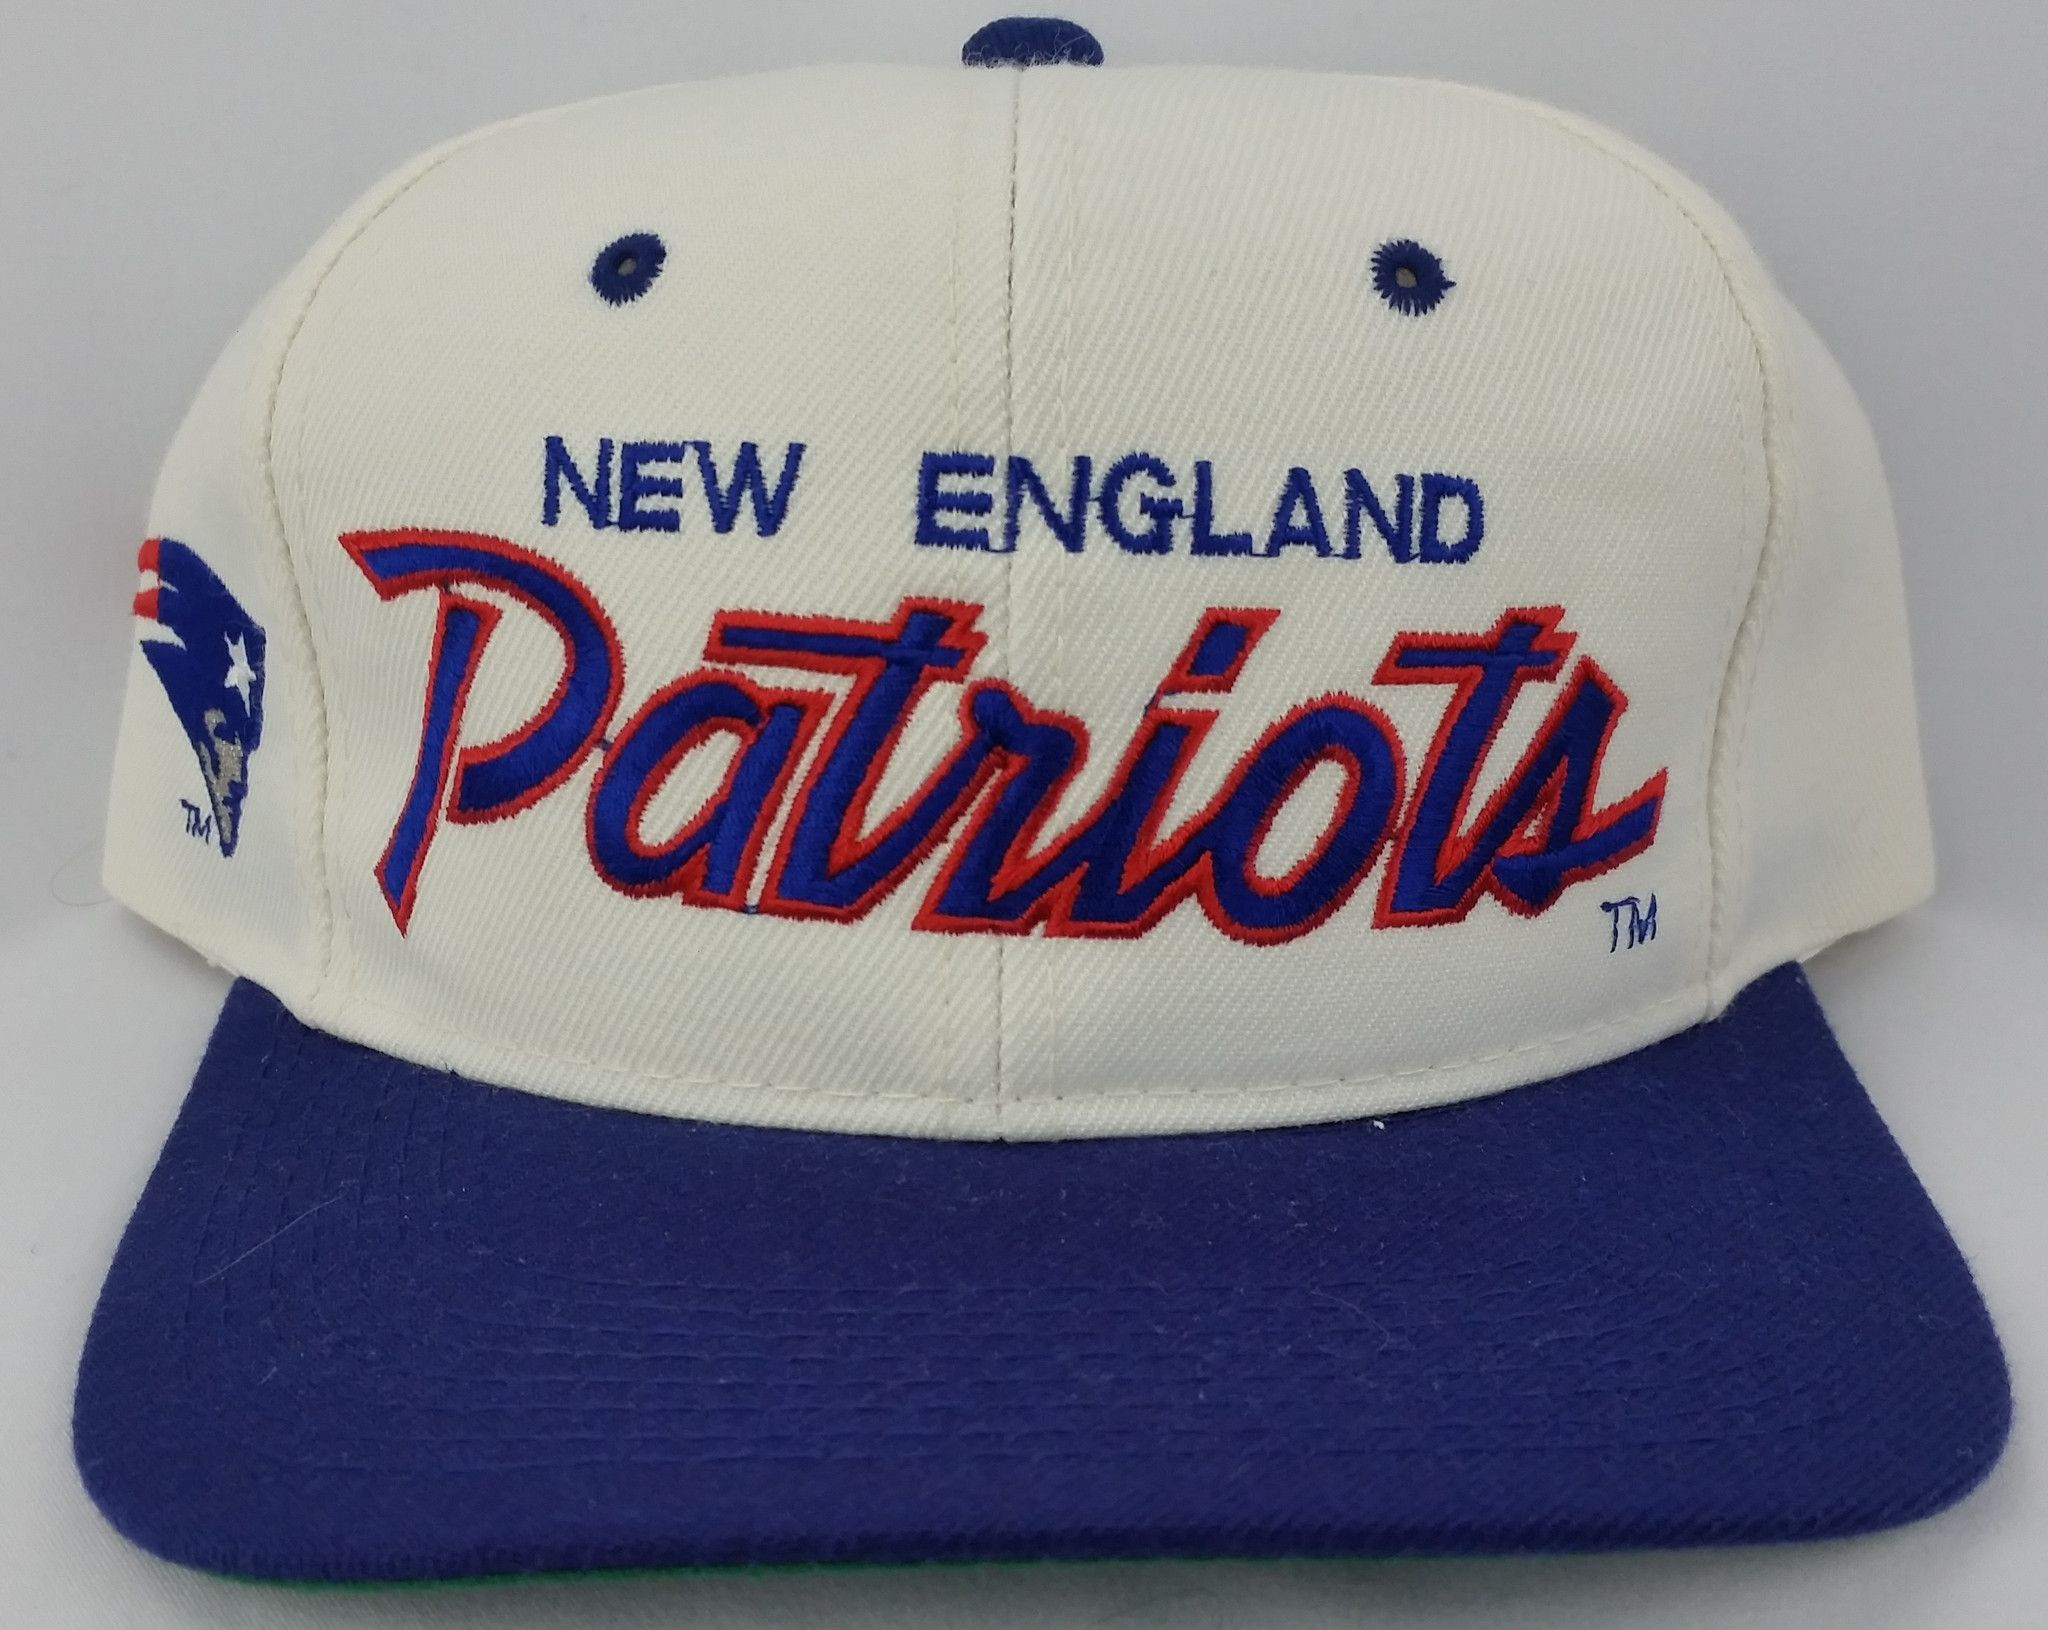 6f72a0606cb New England Patriots Vintage Snapback Sports Specialties Hat NFL Pro Line  Cap